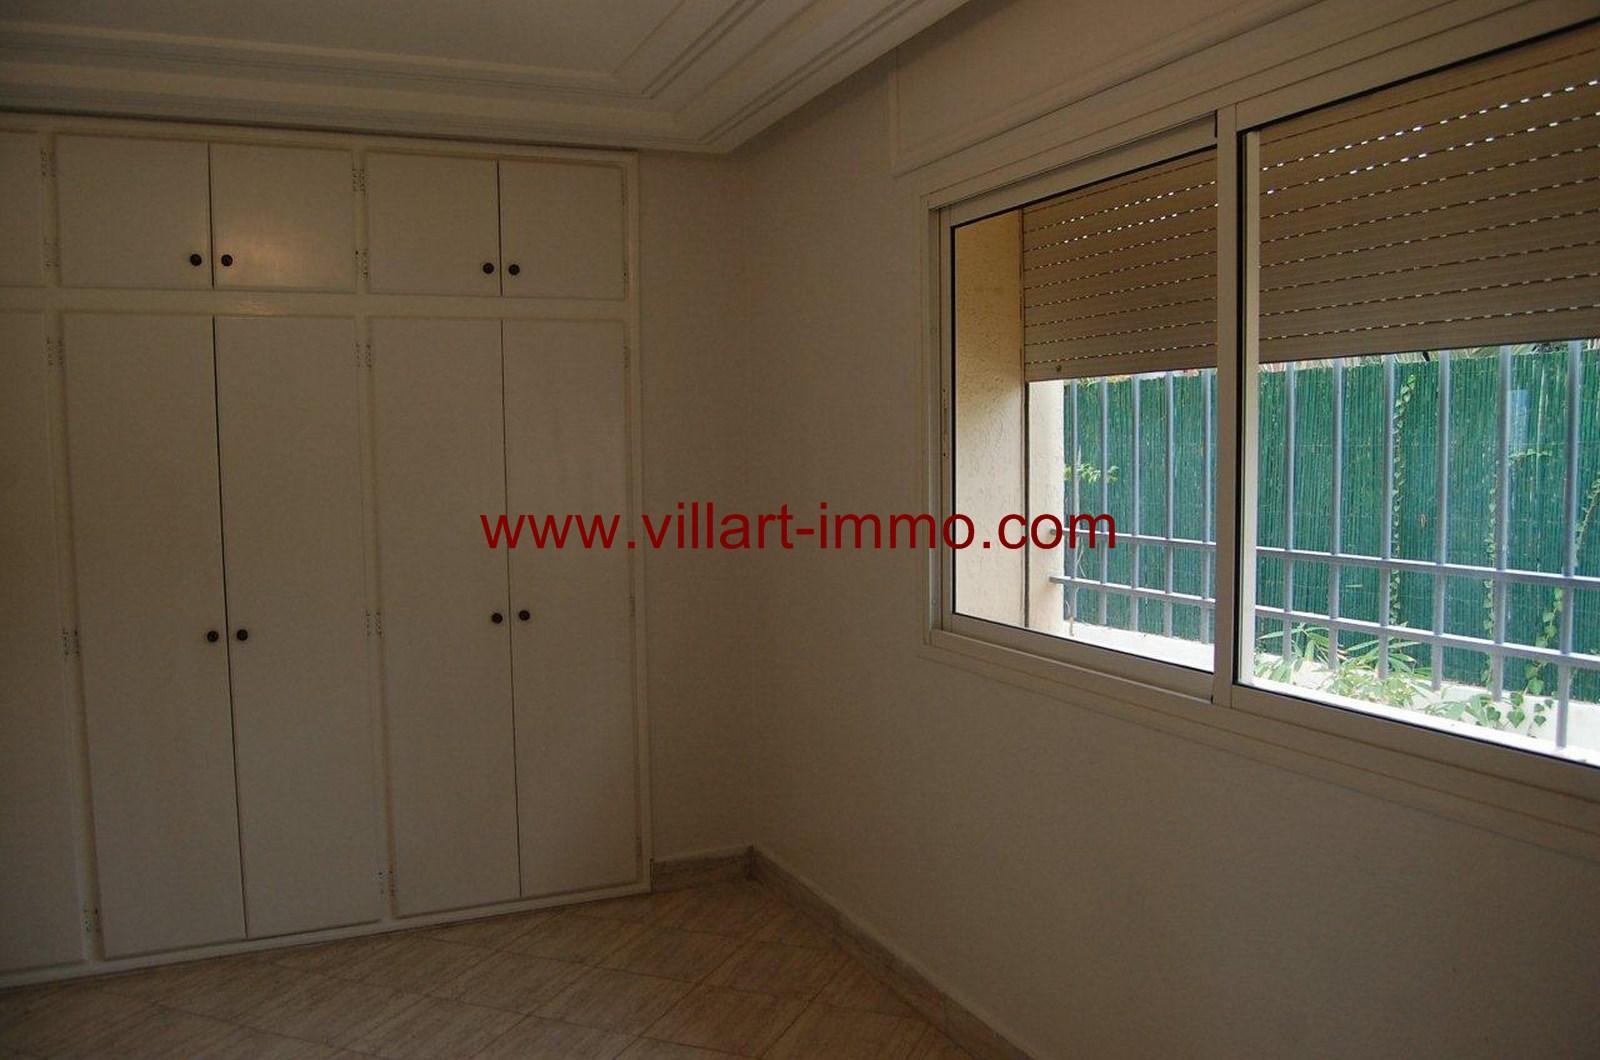 8-vente-villa-tanger-malabata-chambre-2-va362-villart-immo